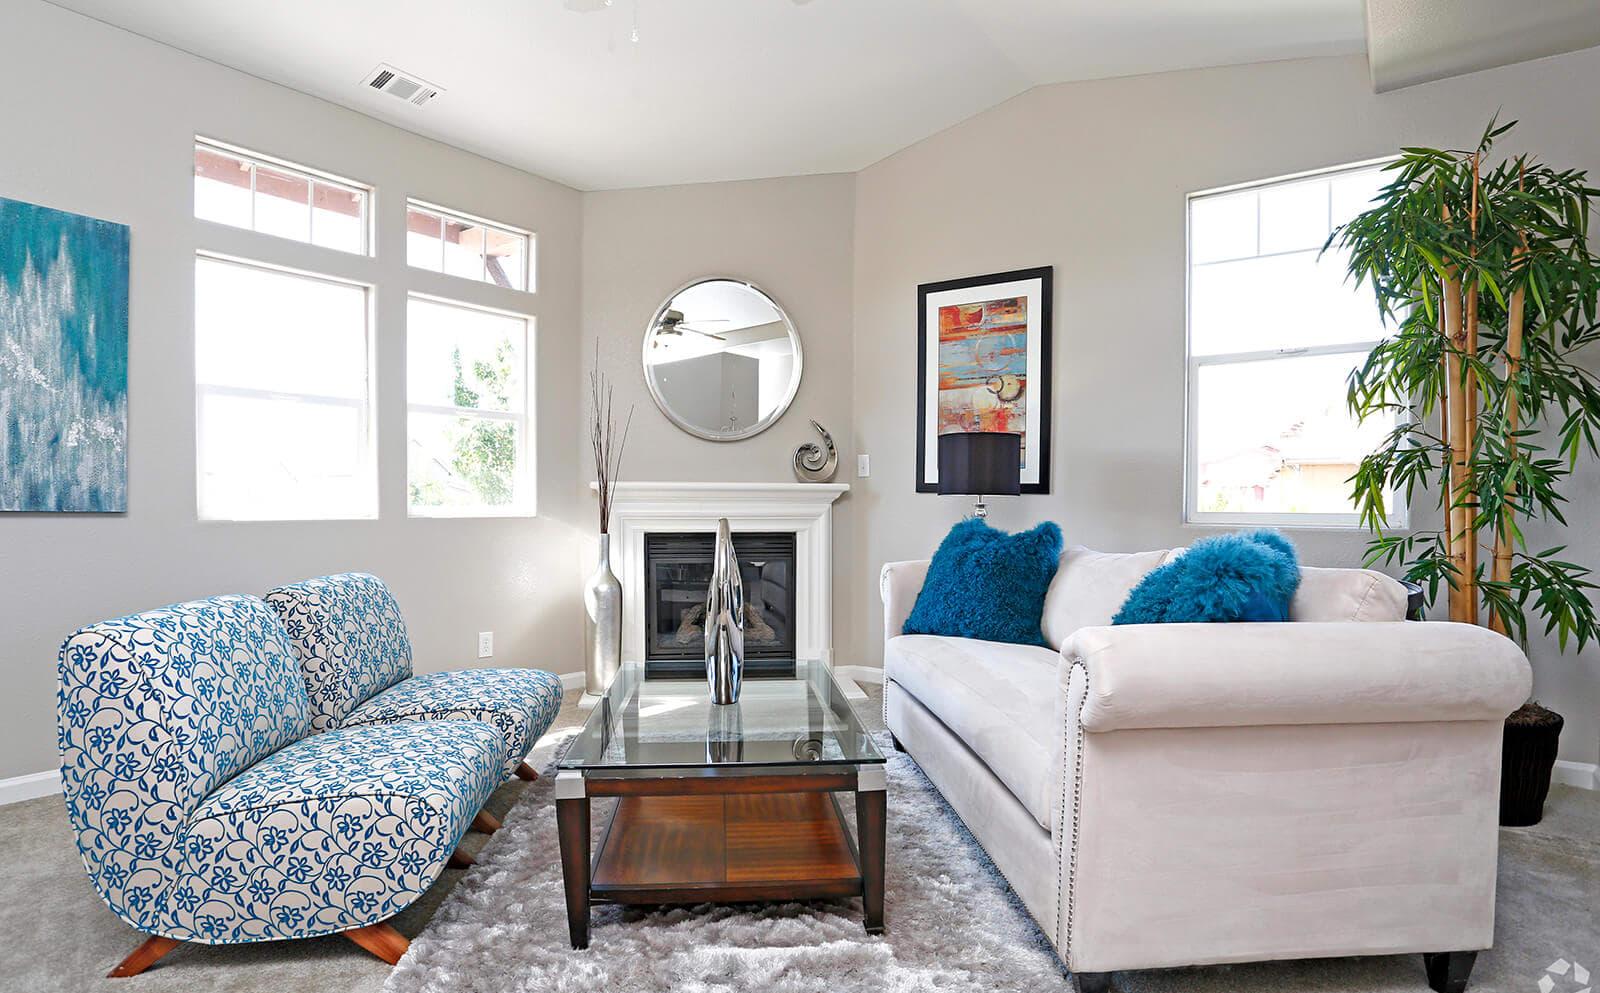 Apartment Interiorat Caviata at Kiley Ranch, Nevada, 89436